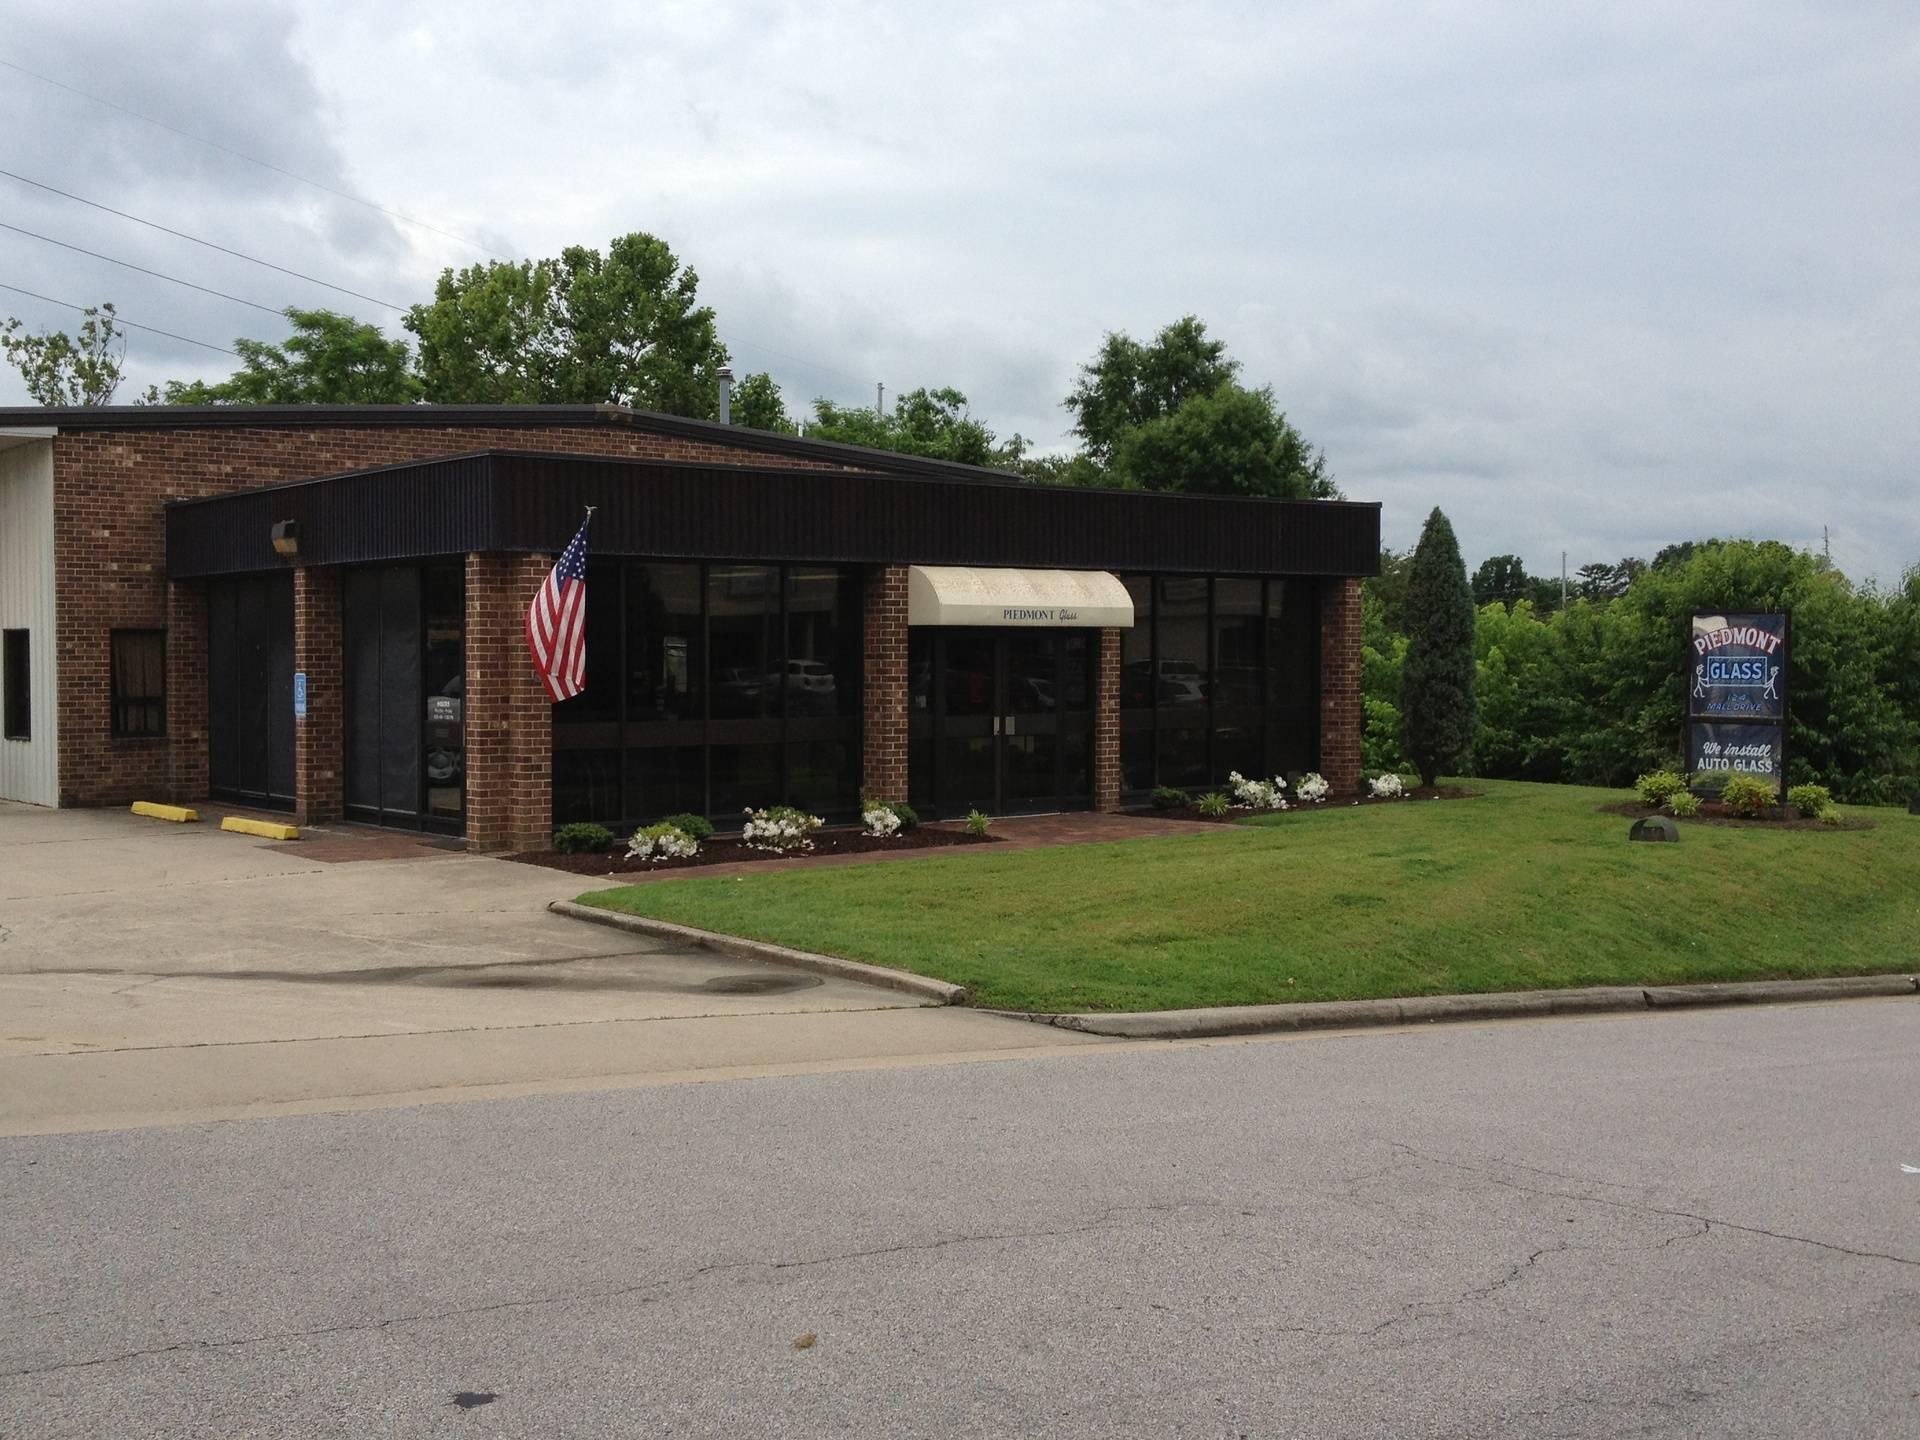 Piedmont Glass, 124 Mall Drive, Danville, Virginia, 24540, United States